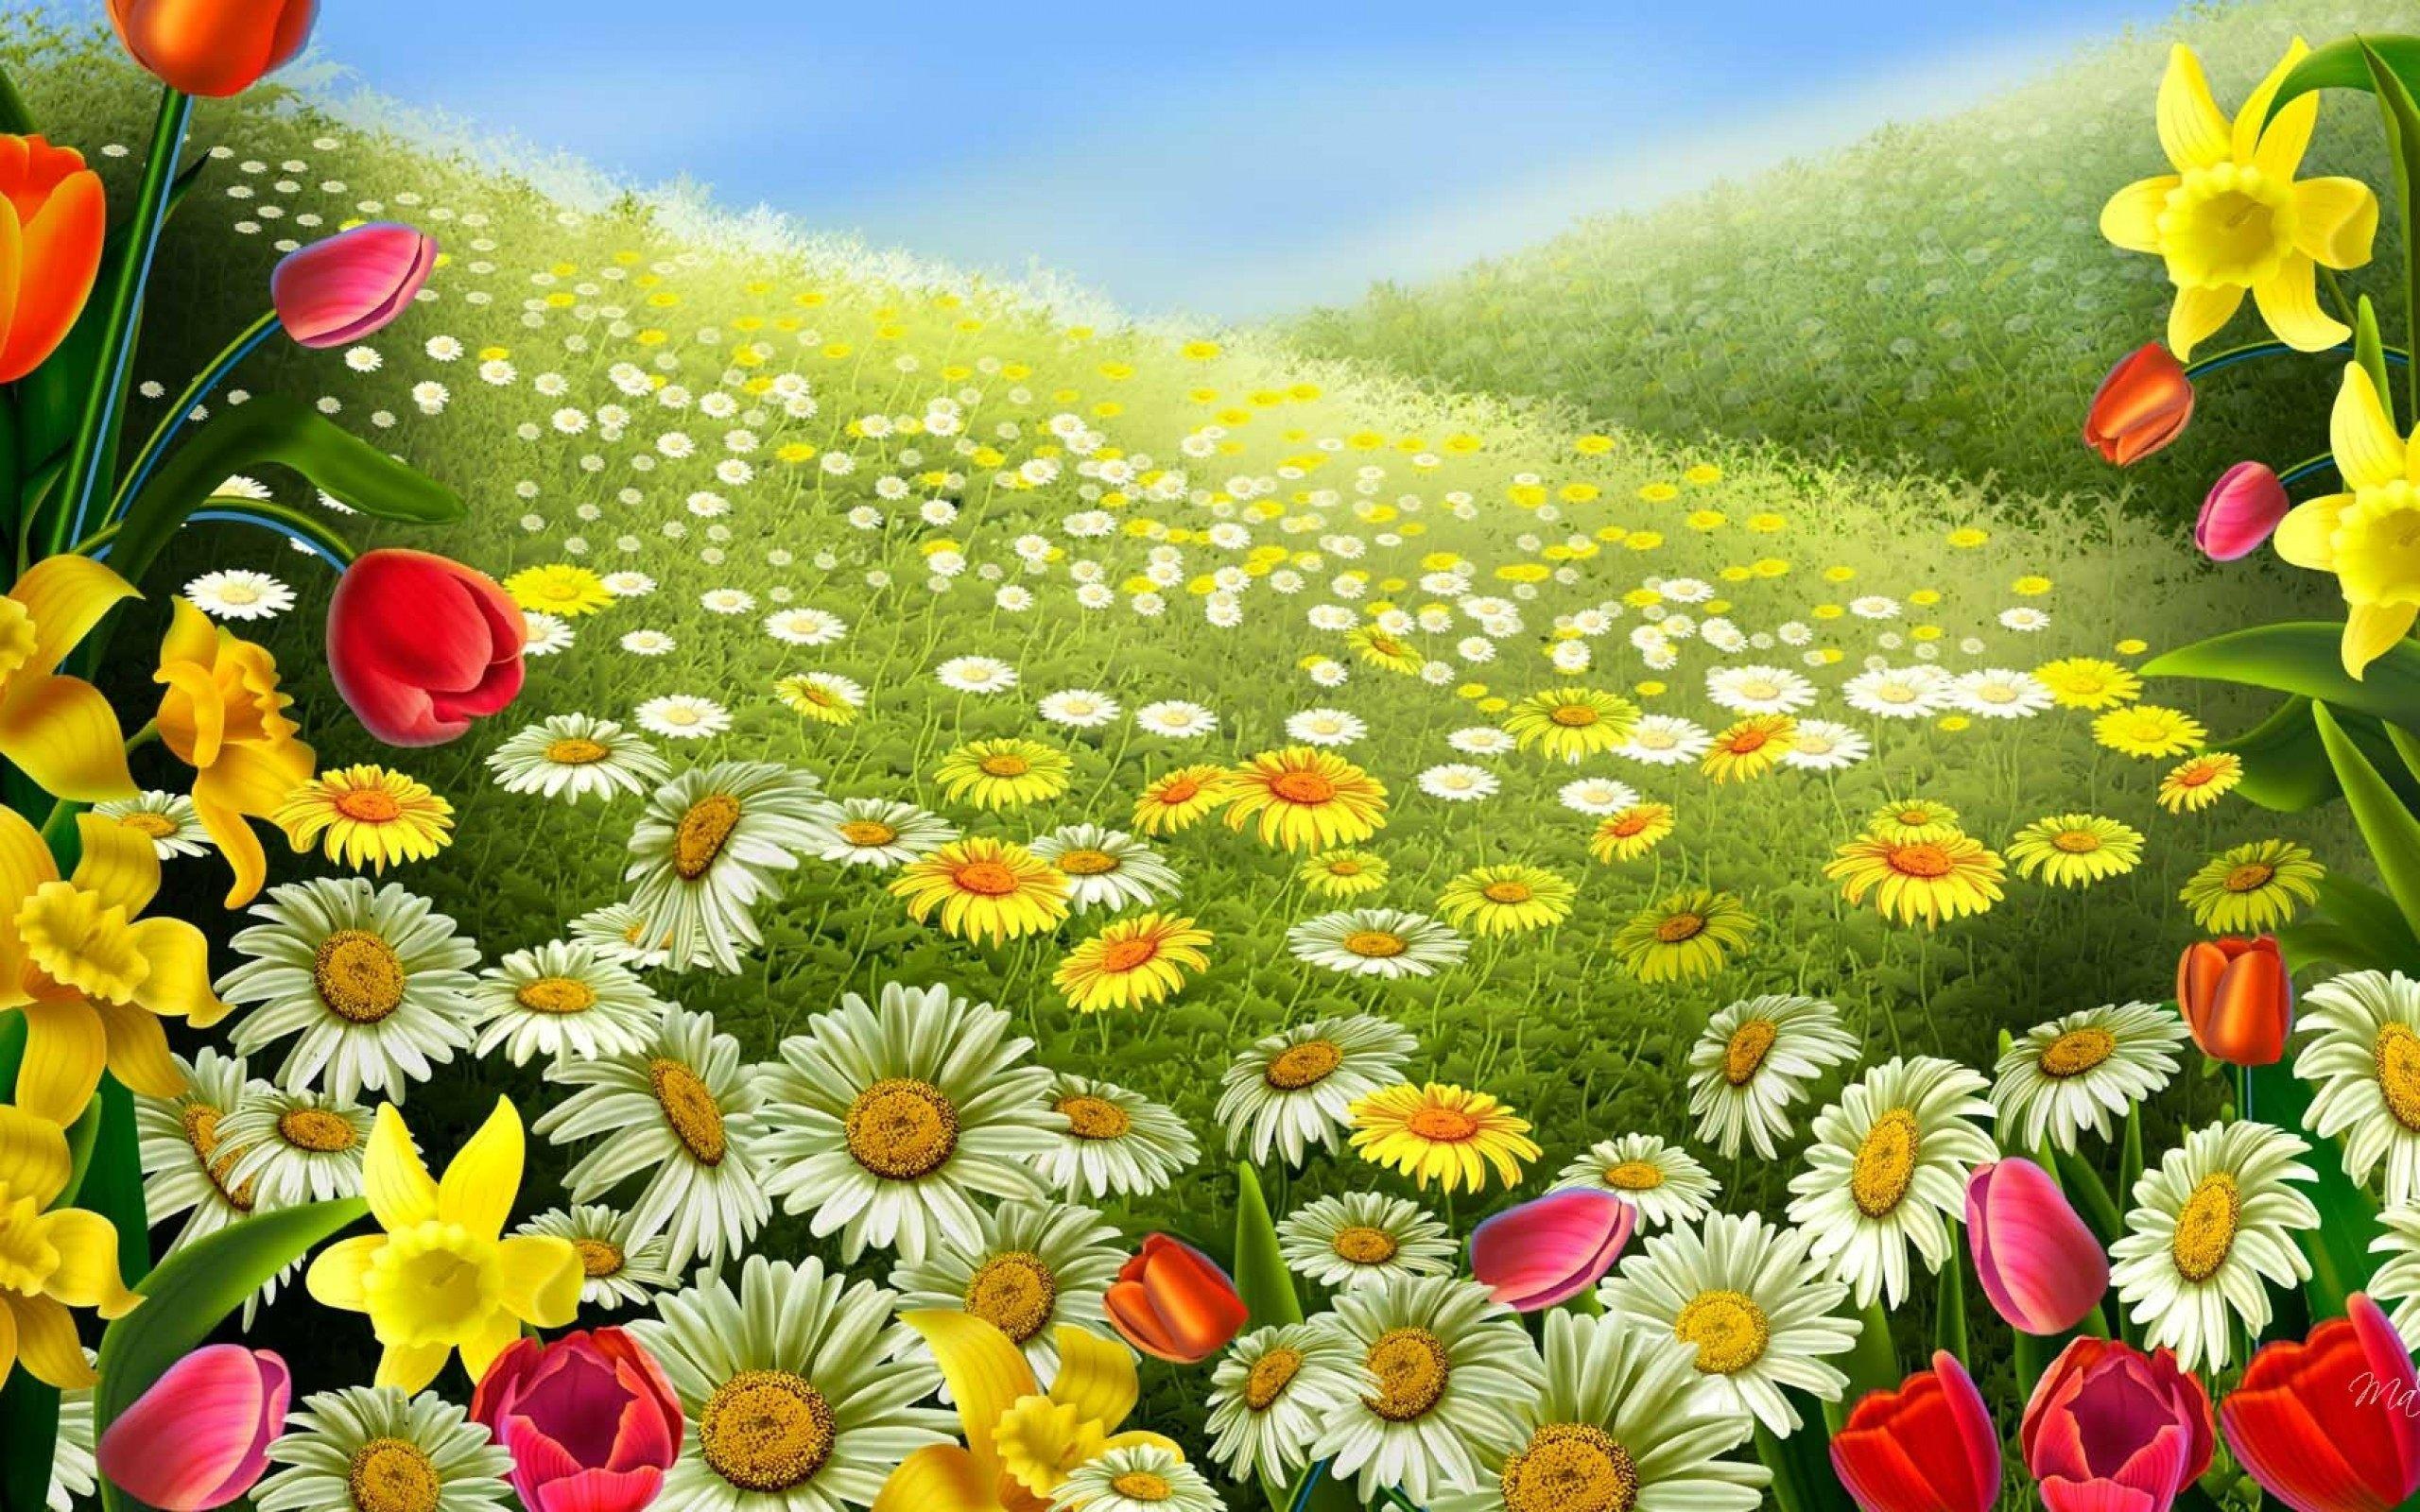 0 Garden Wallpapers For Desktop Group Garden Wallpapers For Desktop Group